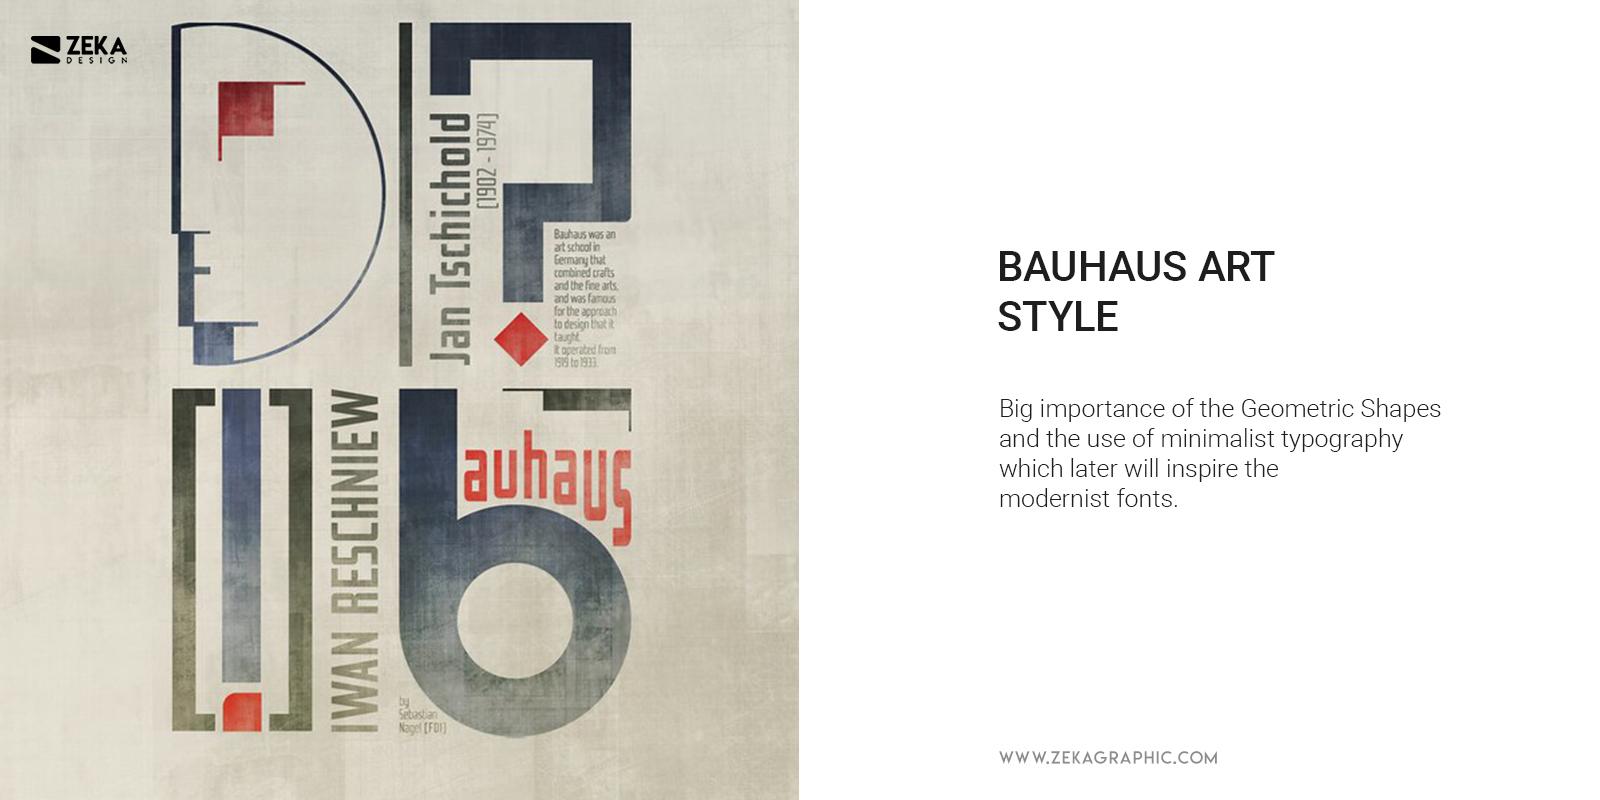 Bauhaus Design Style Geometric Shapes and Minimalist Typography